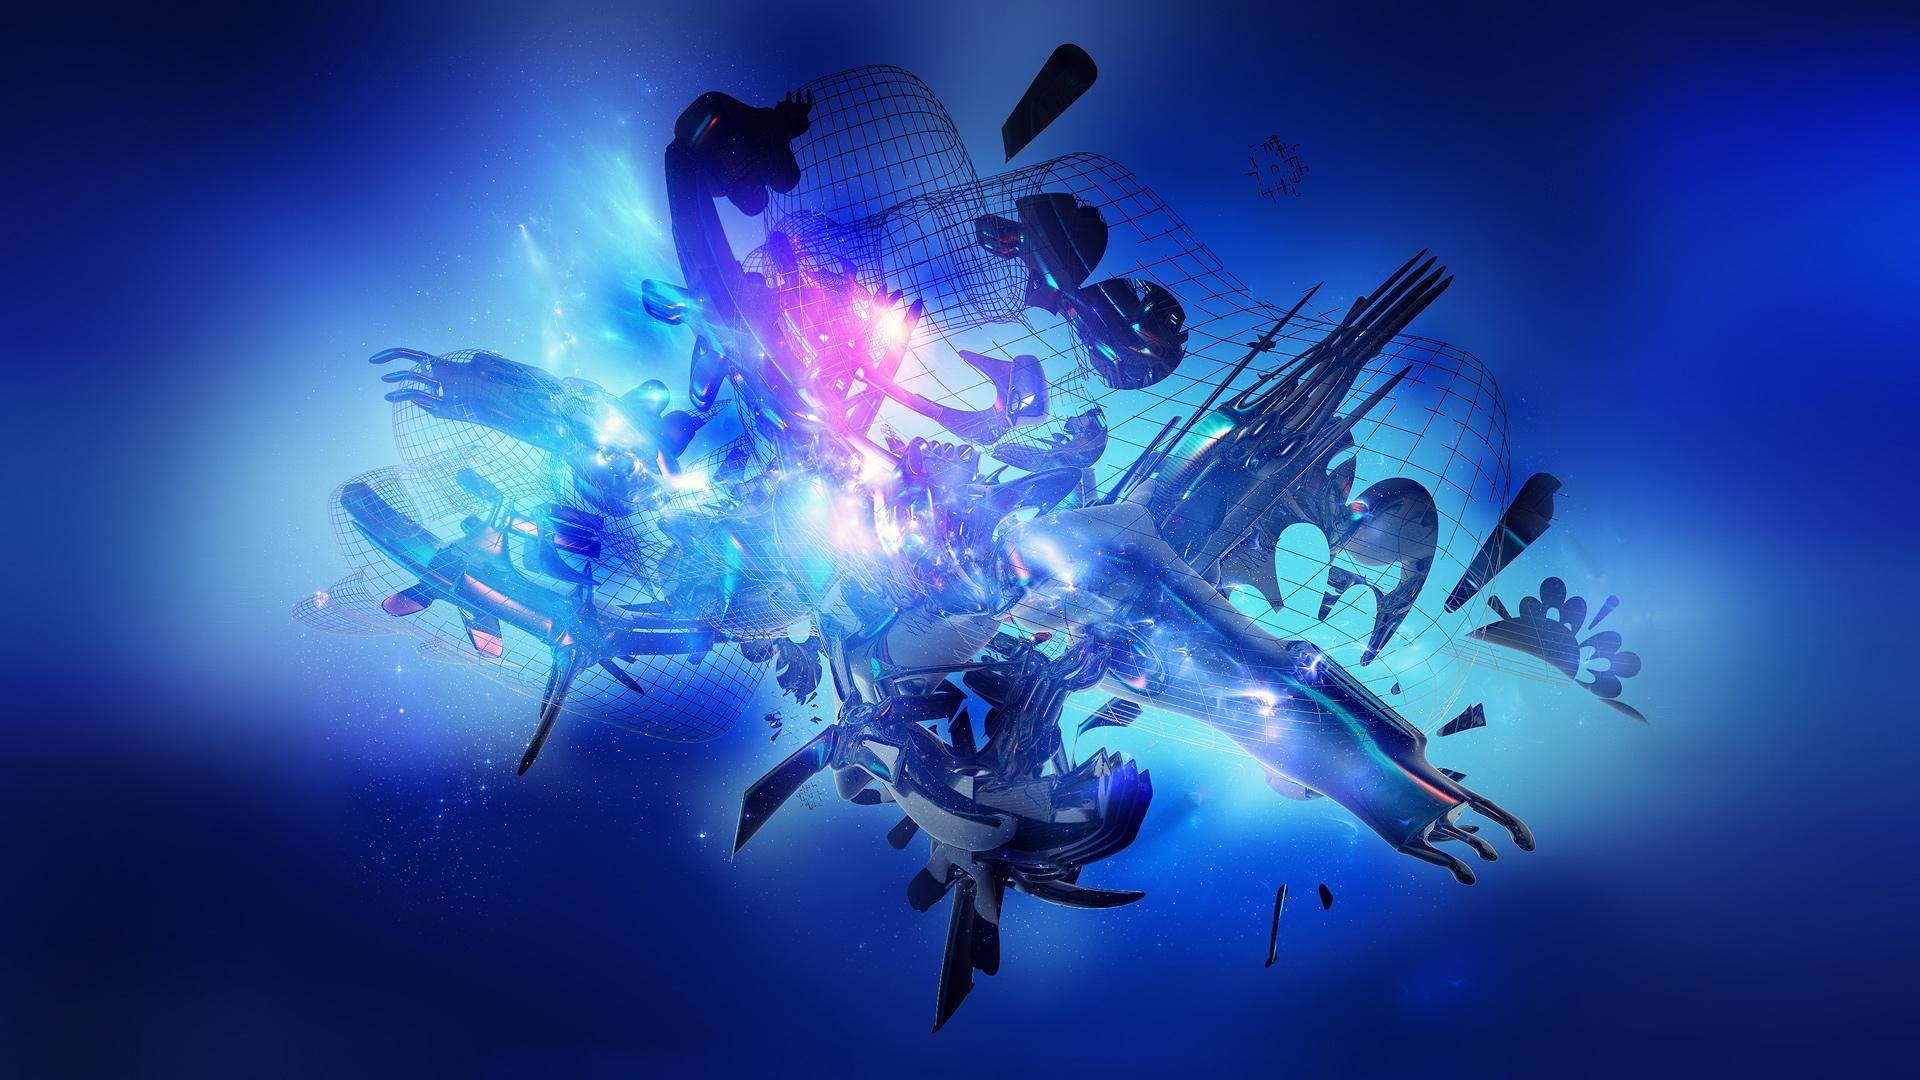 Wallpaper : water, space, sky, underwater, Flash, graphics